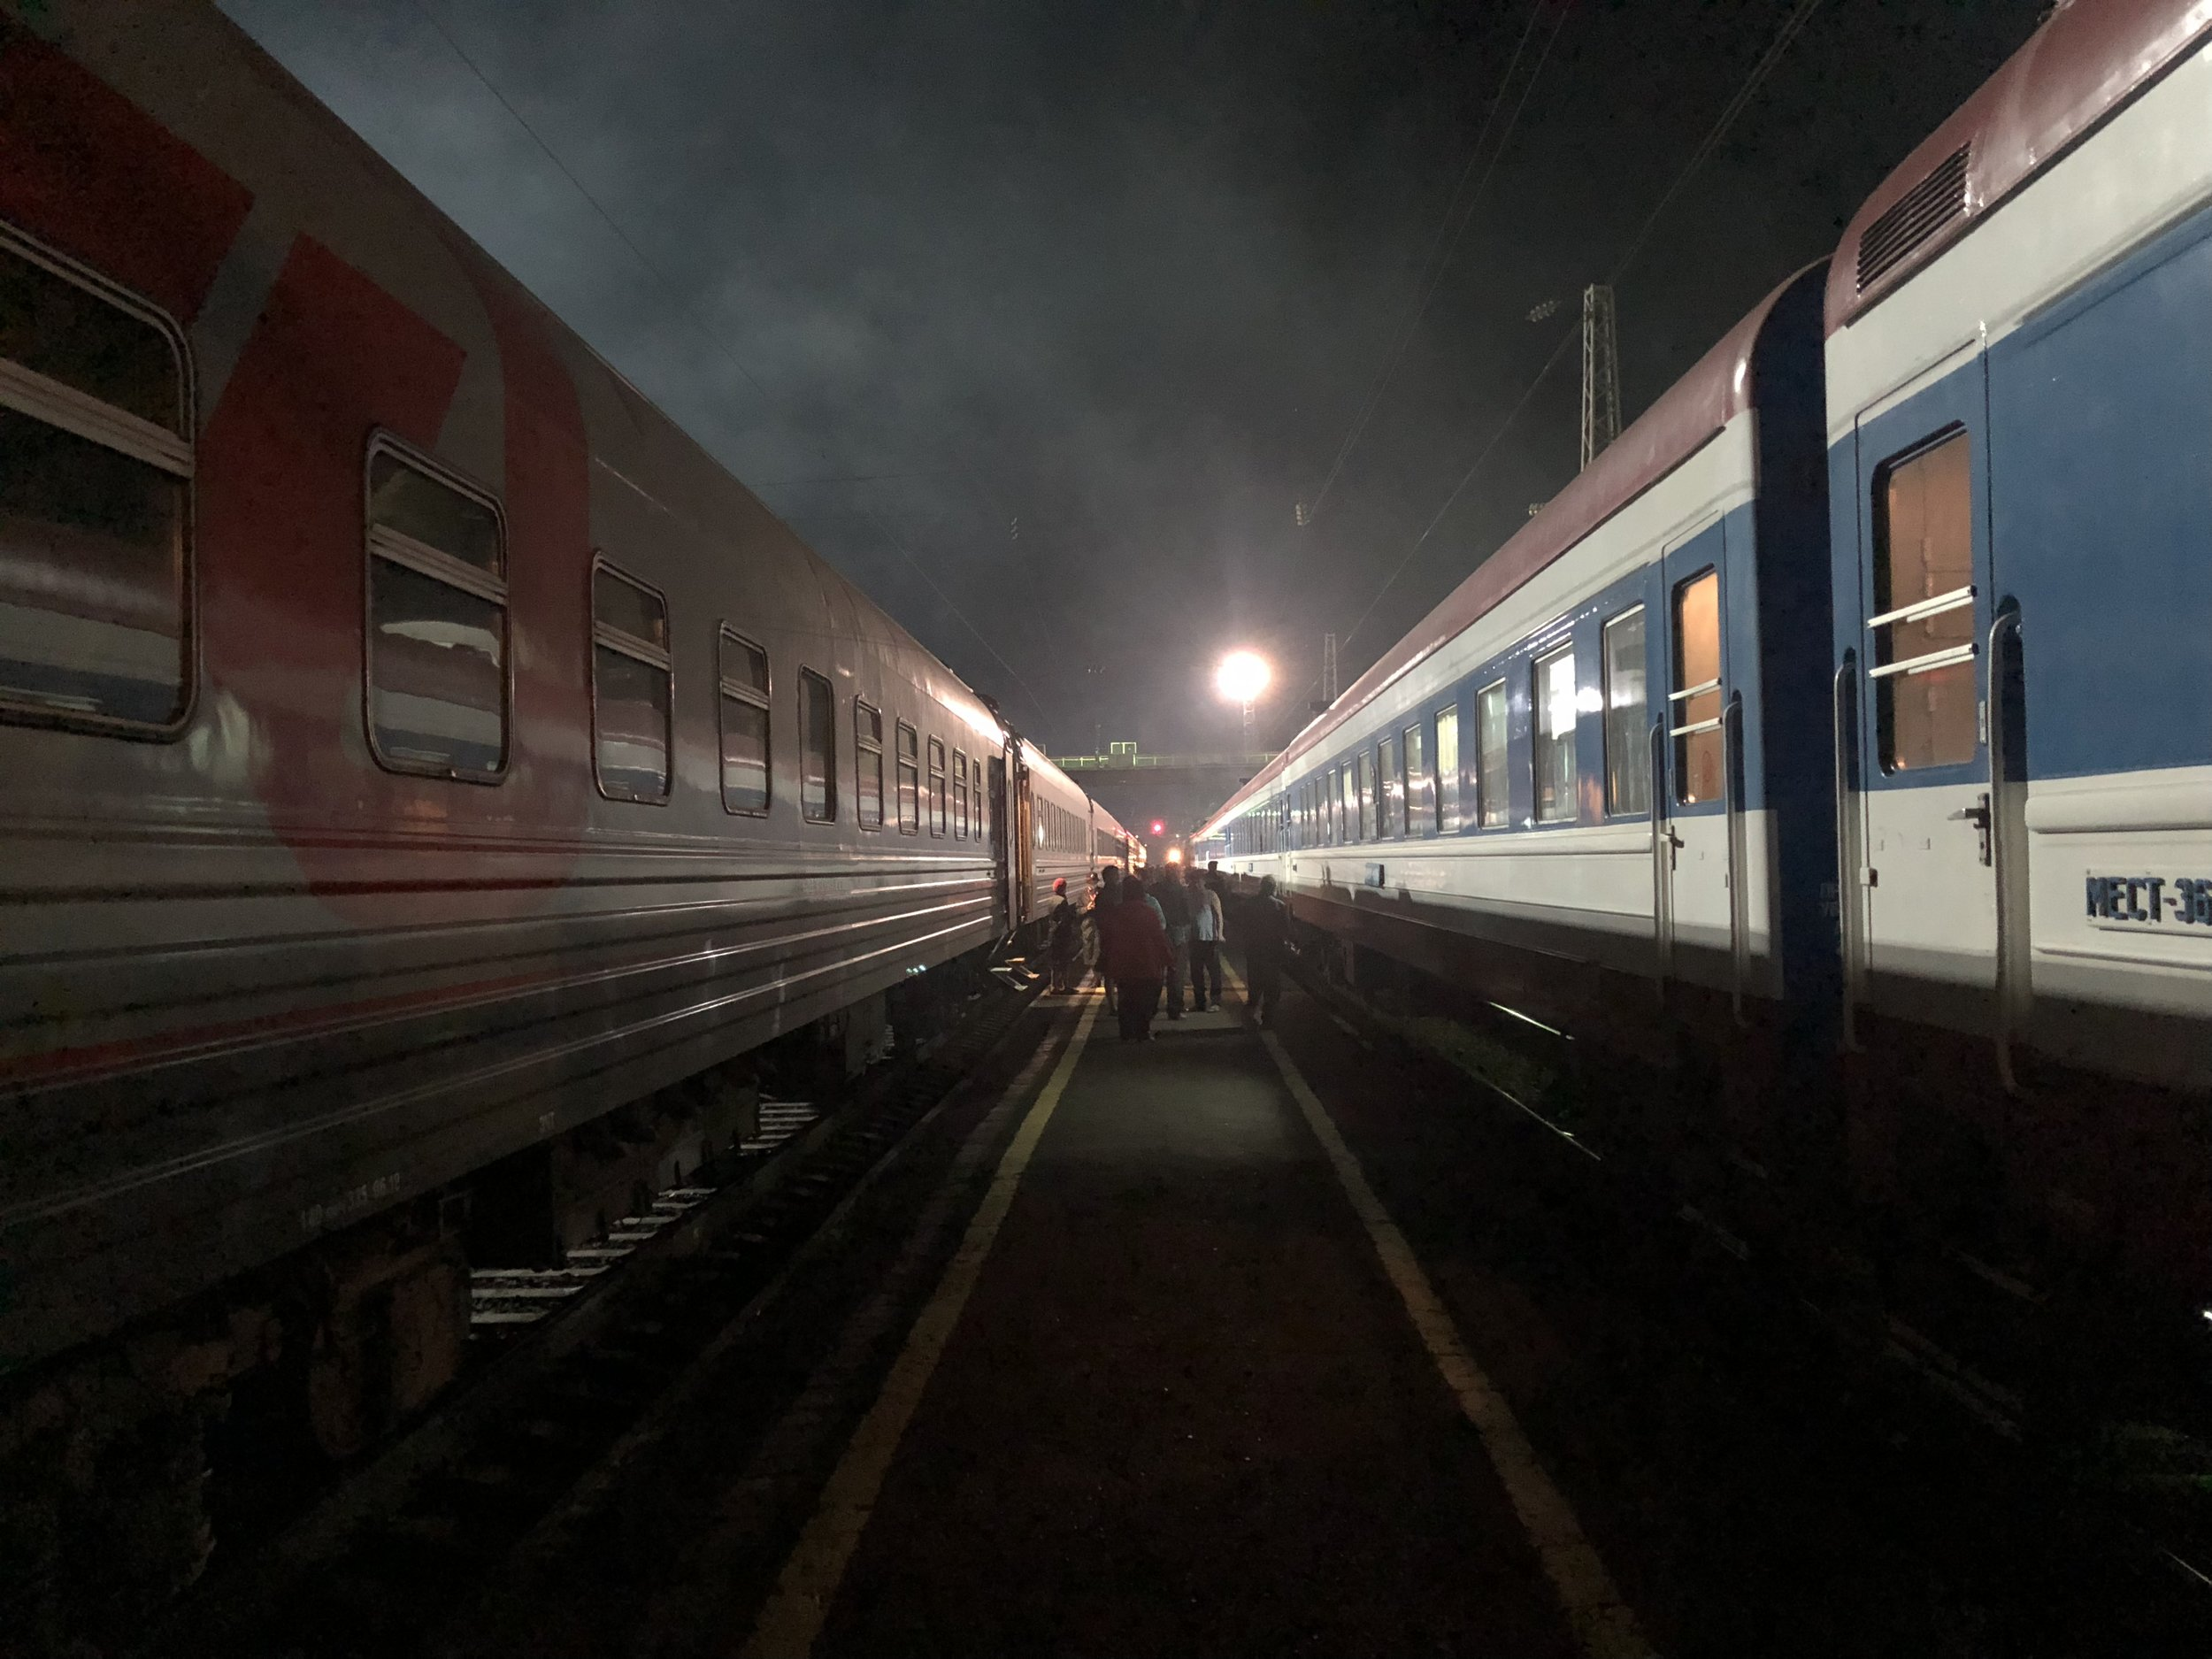 On the way to Irkutsk